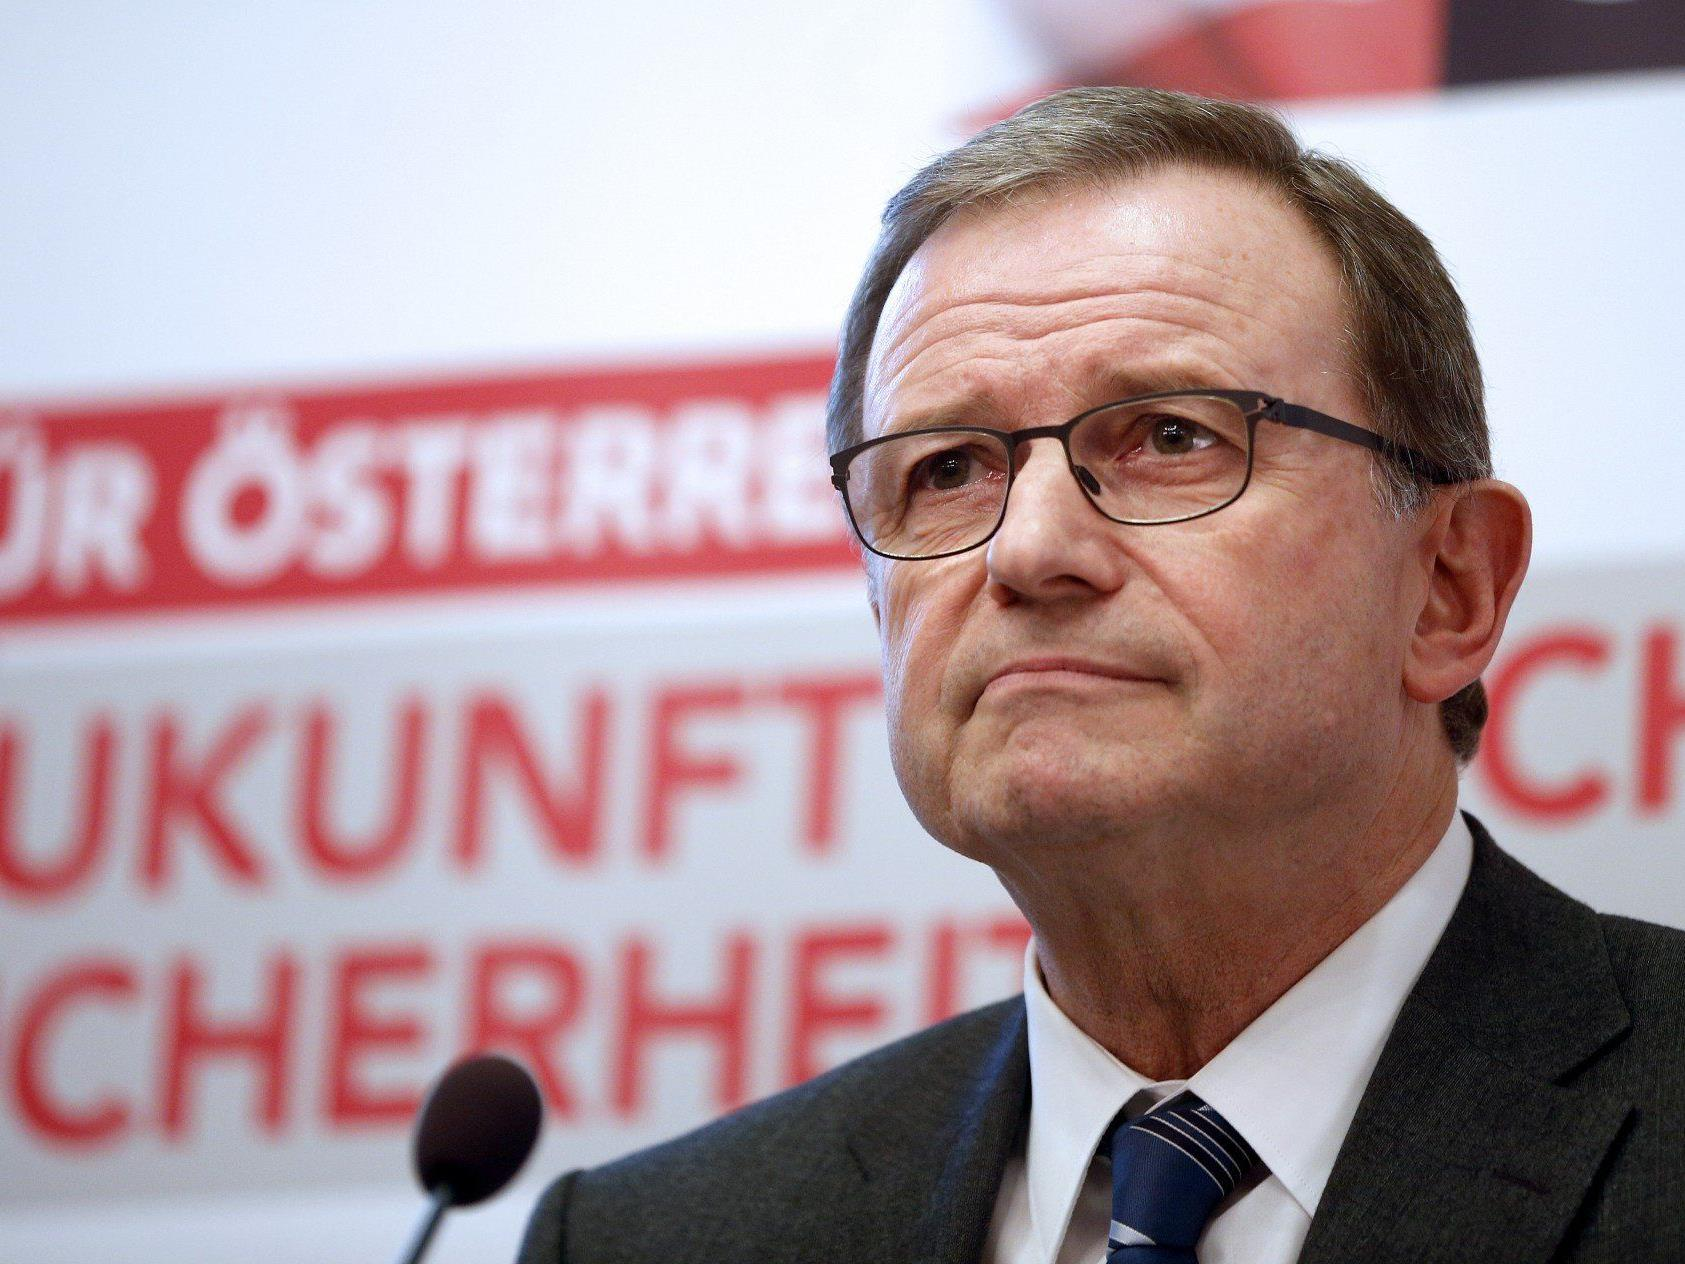 ÖVP-Klubobmann Karlheinz Kopf verlor sein Direktmandat